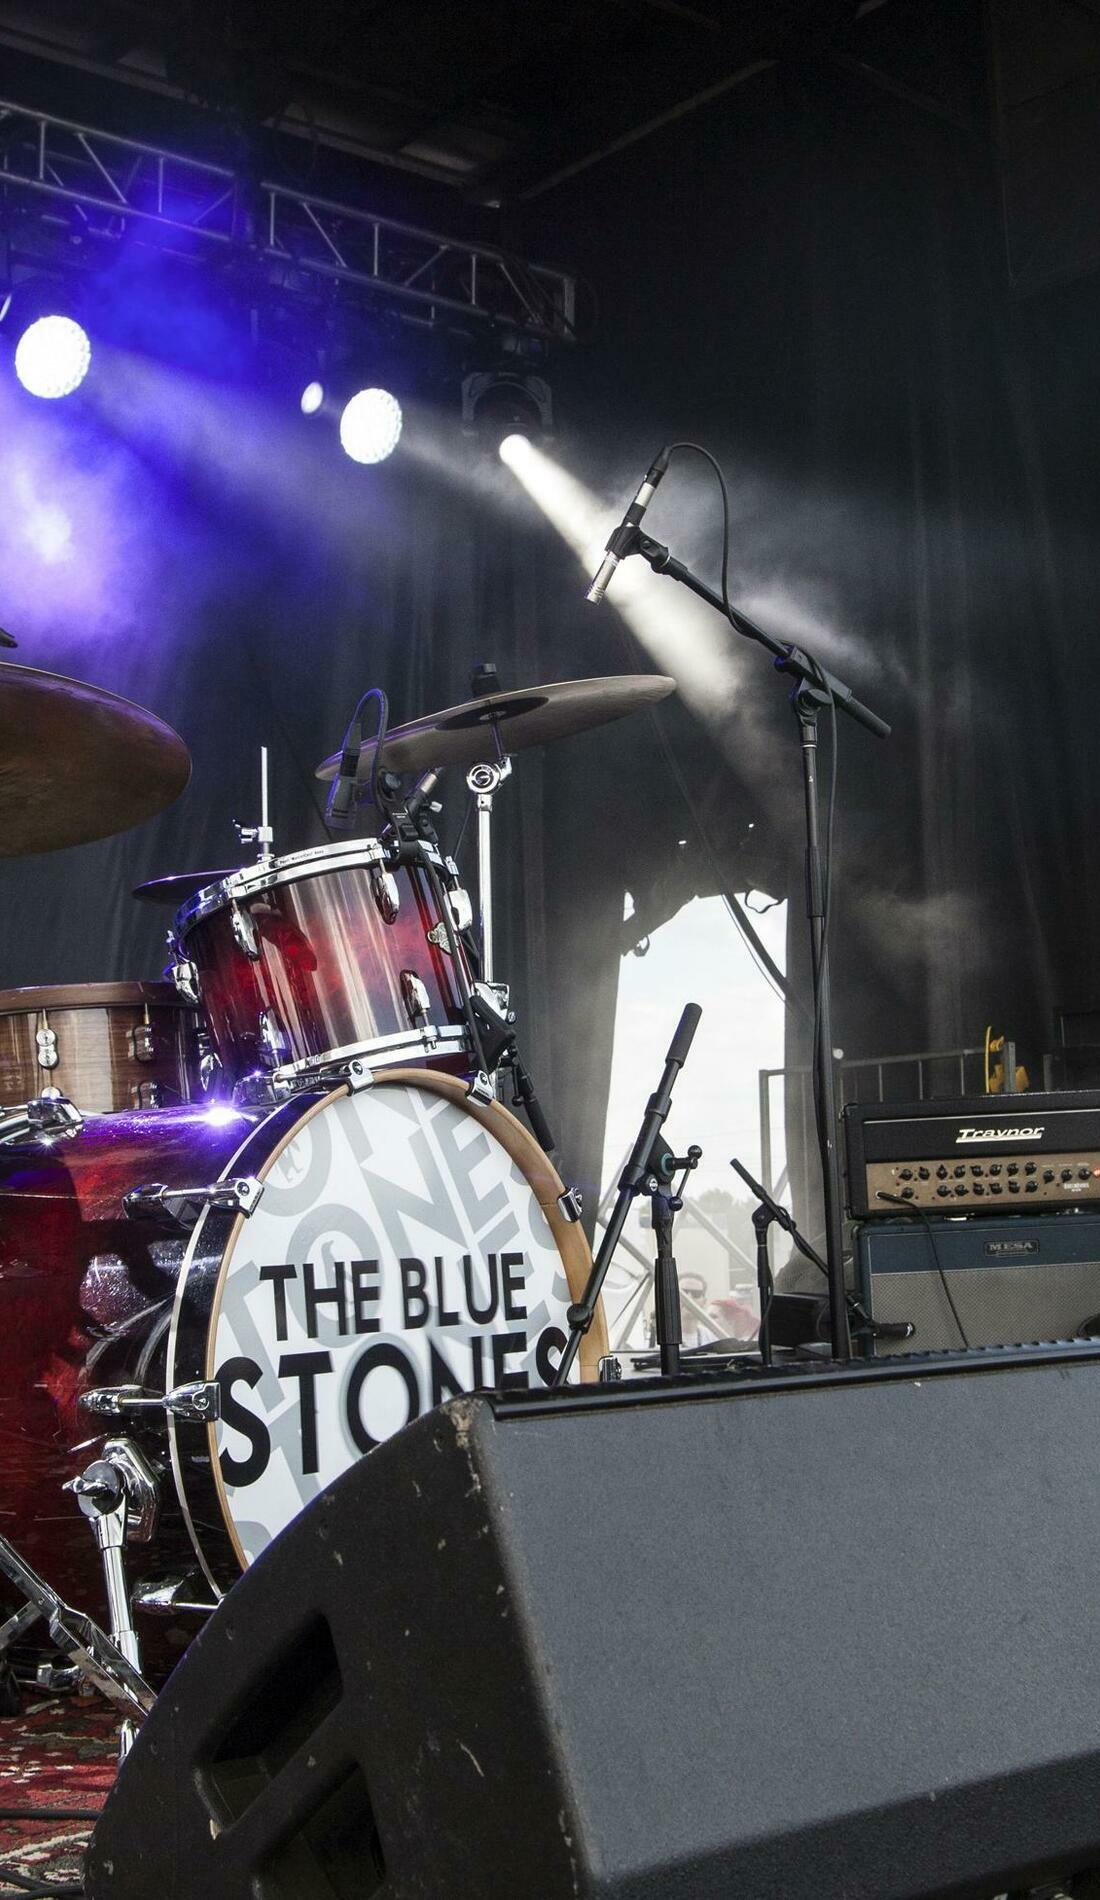 A The Blue Stones live event